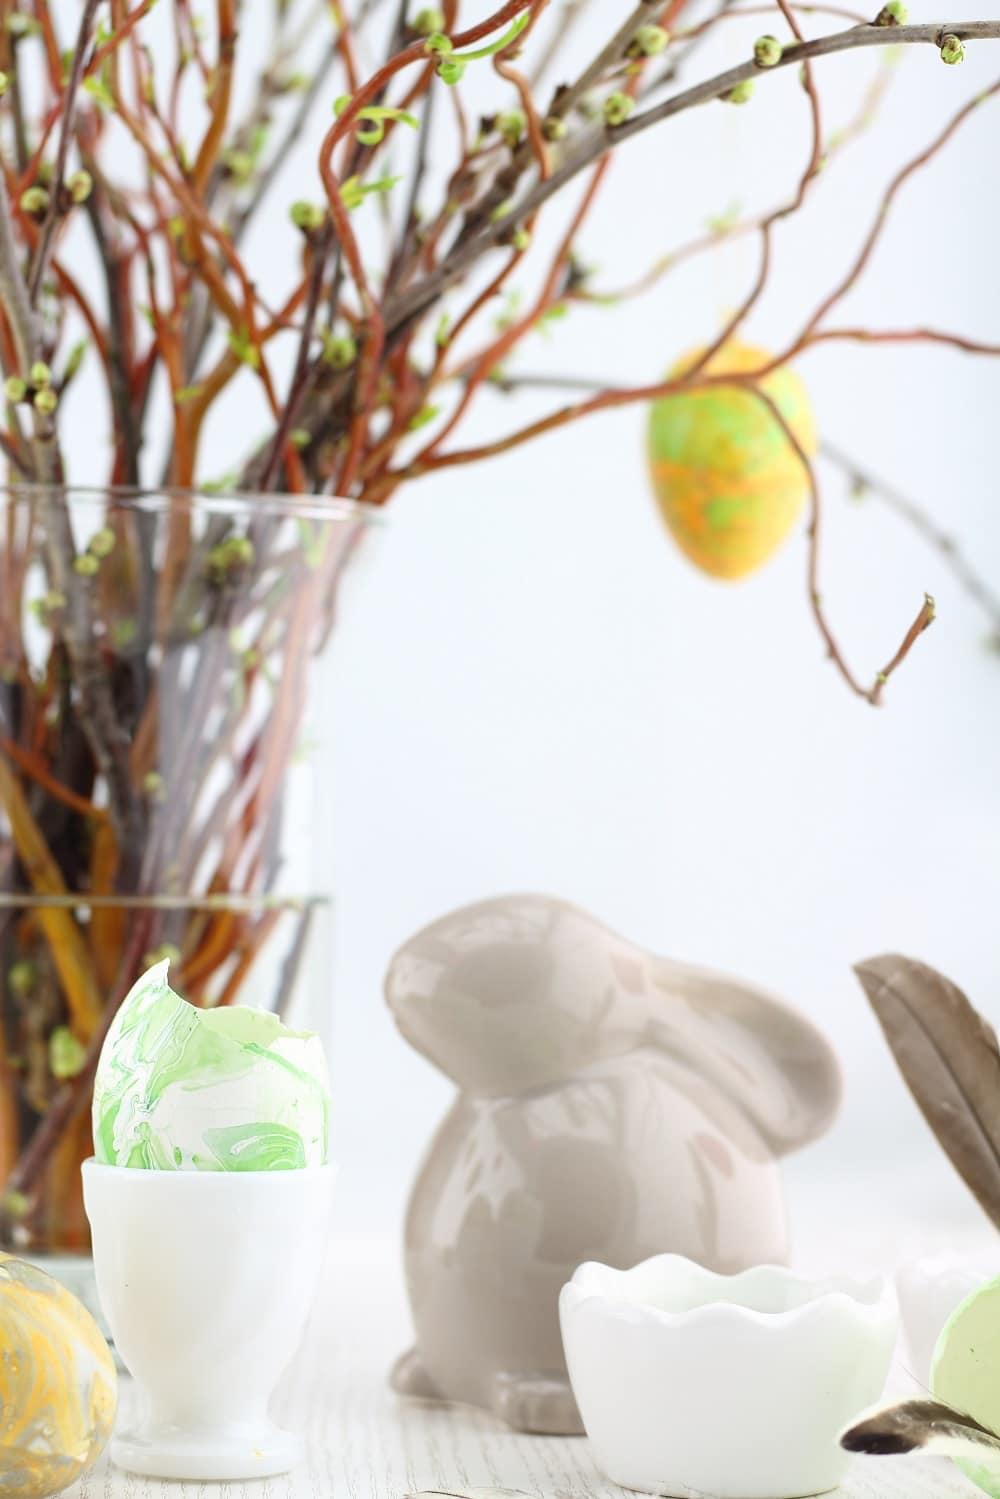 Oster-DIY] Ostereier marmorieren mit Nagellack - HANDMADE Kultur